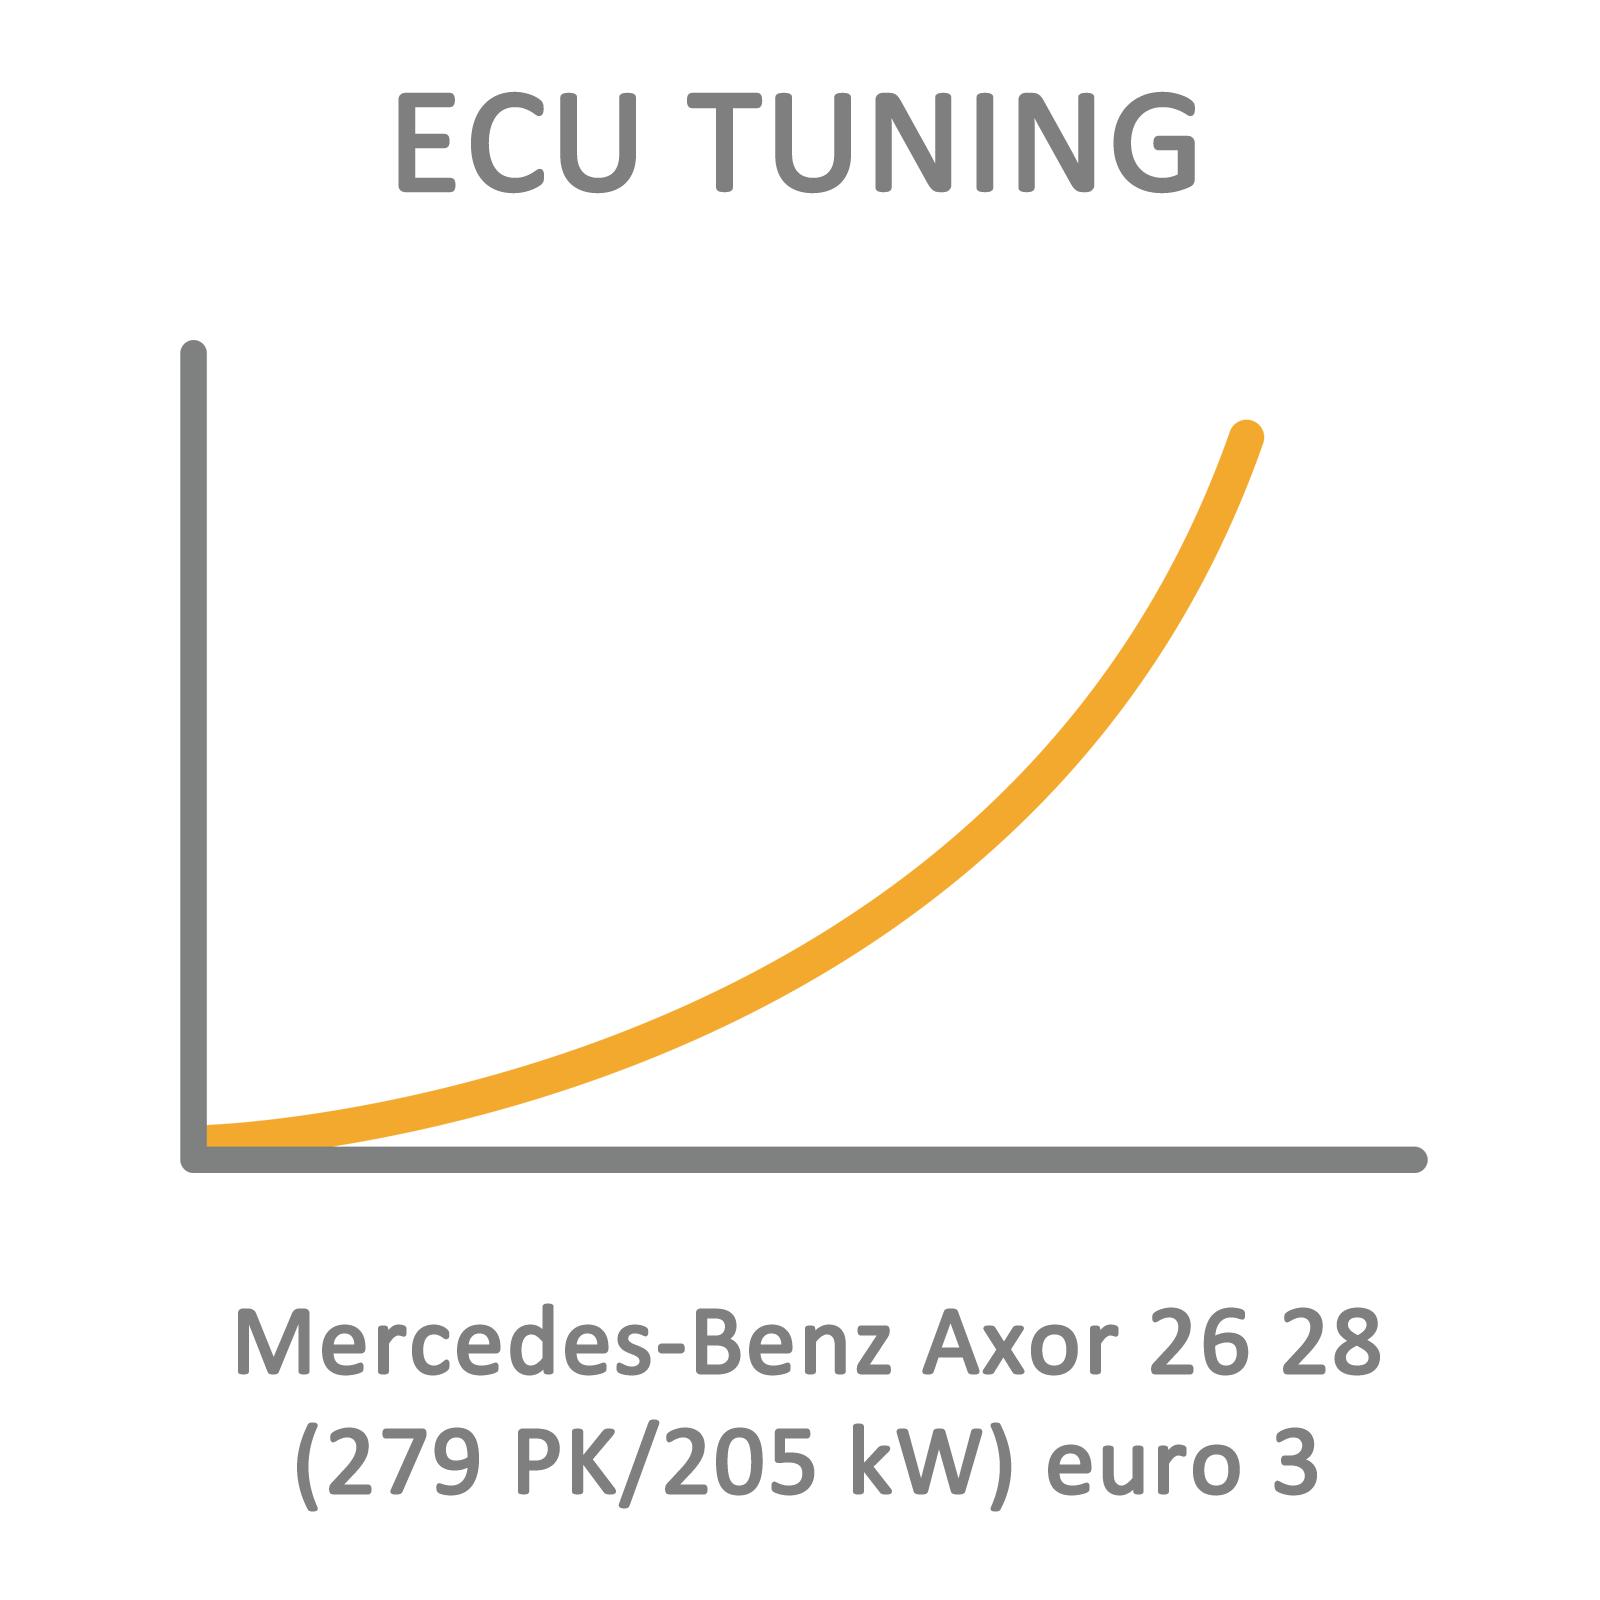 Mercedes-Benz Axor 26 28 (279 PK/205 kW) euro 3 ECU Tuning